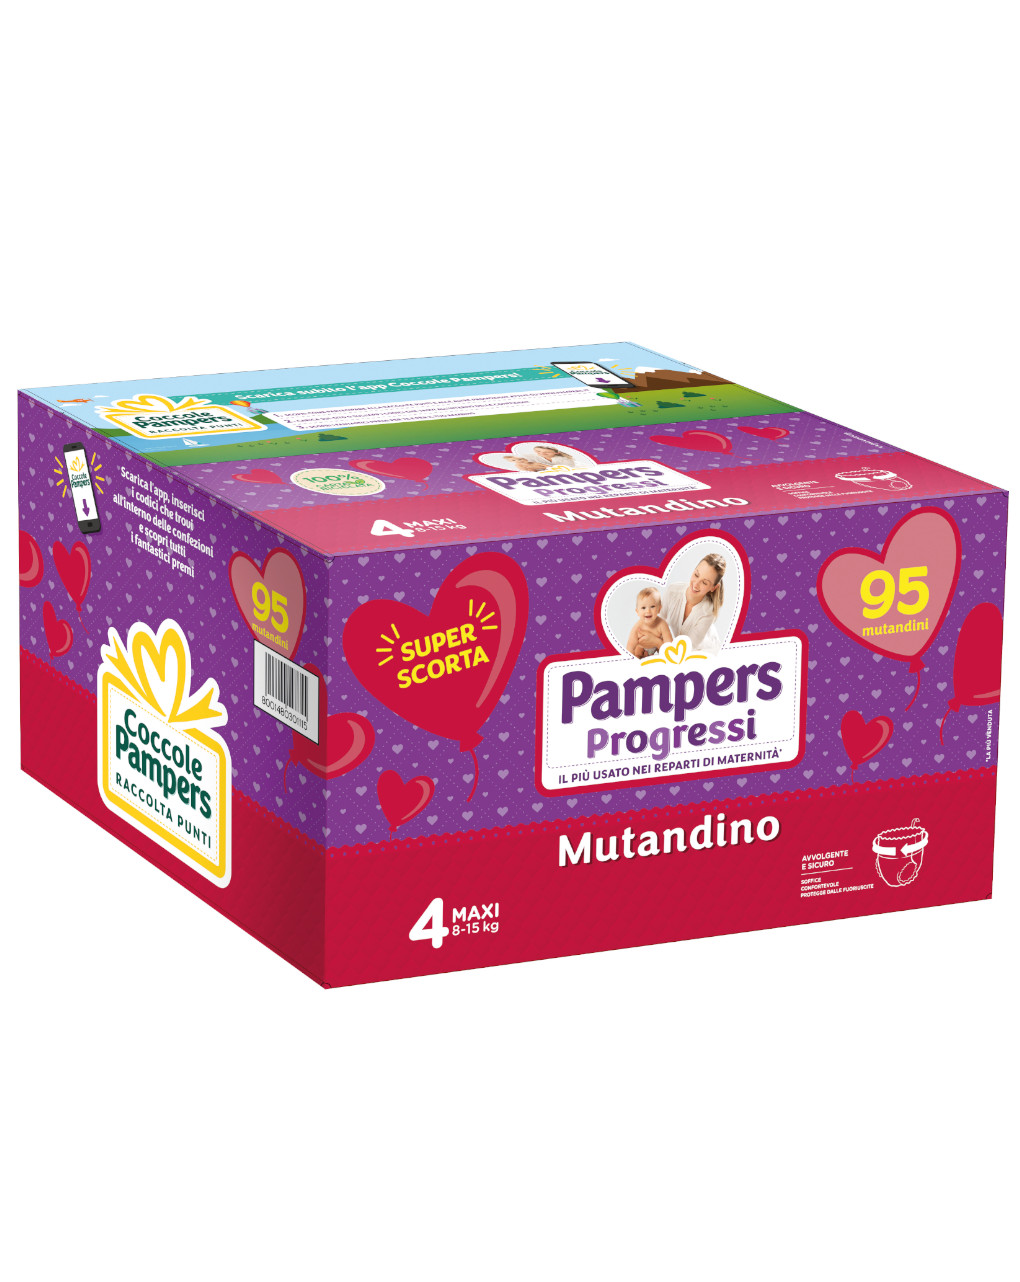 Pannolini mutandino pentapack progressi tg. 4 (95 pz) - Pampers